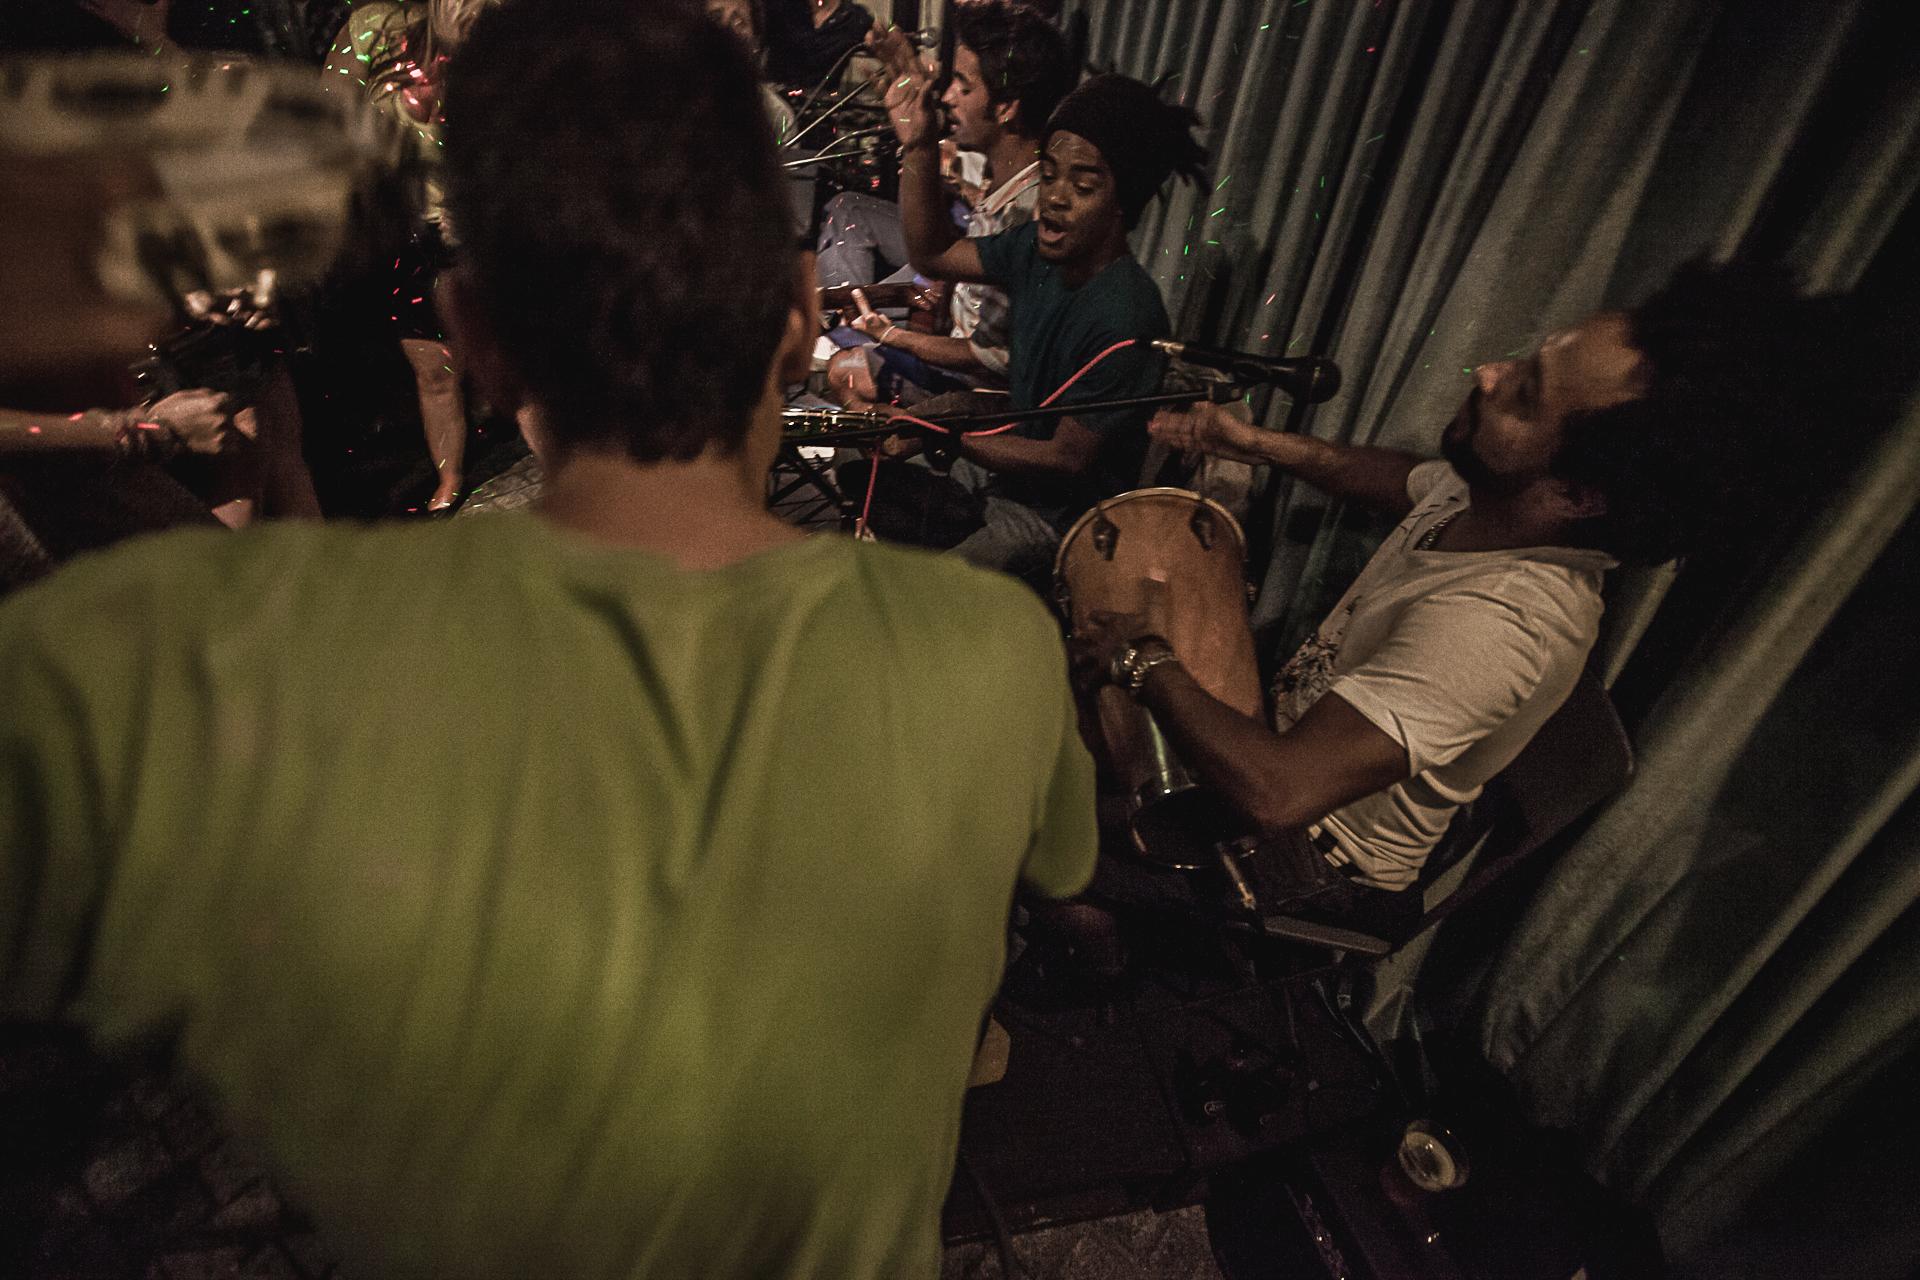 Quintal do Samba Rua Concert On Stage Photography Fotografia bonjourmolotov Andre Gigante 10